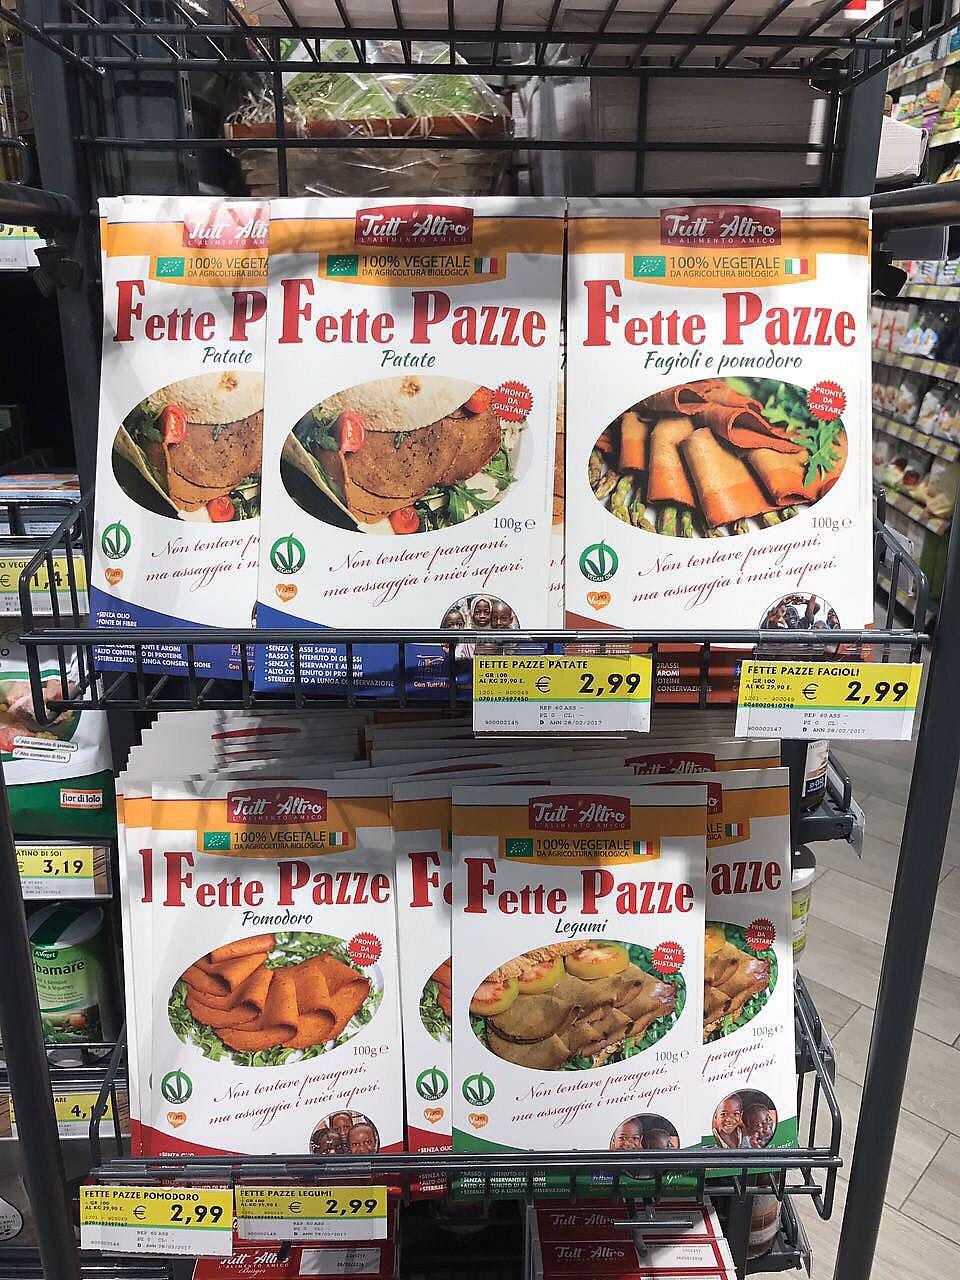 "Photo of Meta Supermercato  by <a href=""/members/profile/PepaKovacs"">PepaKovacs</a> <br/>Vegan Jam <br/> August 18, 2017  - <a href='/contact/abuse/image/97022/294023'>Report</a>"